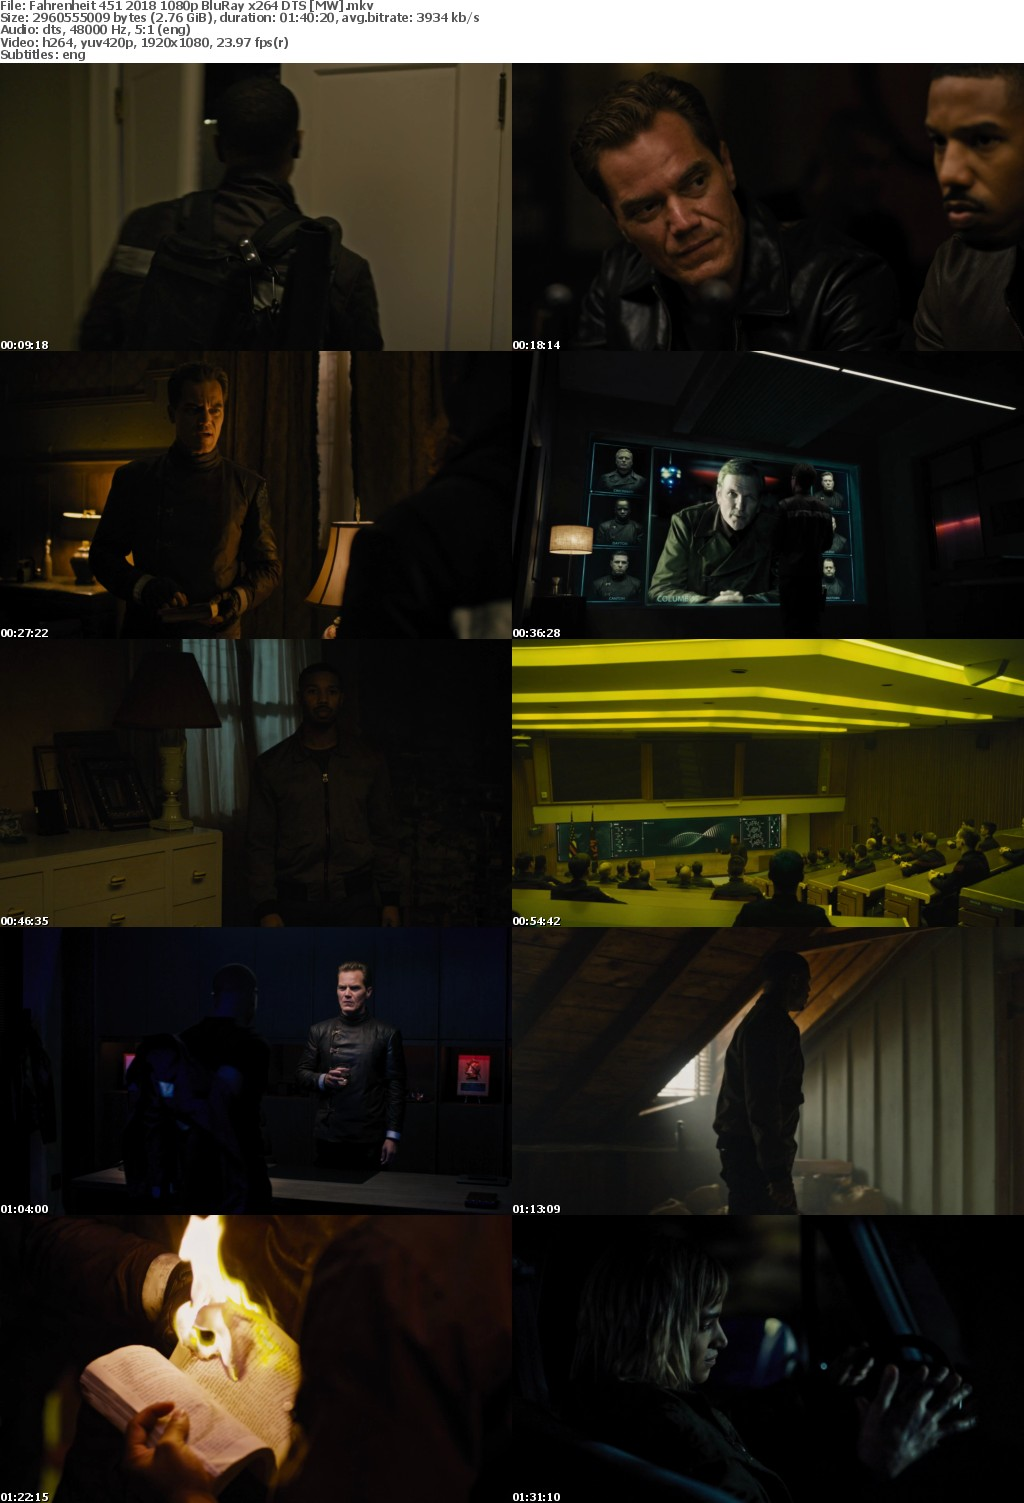 Fahrenheit 451 2018 1080p BluRay x264 DTS MW